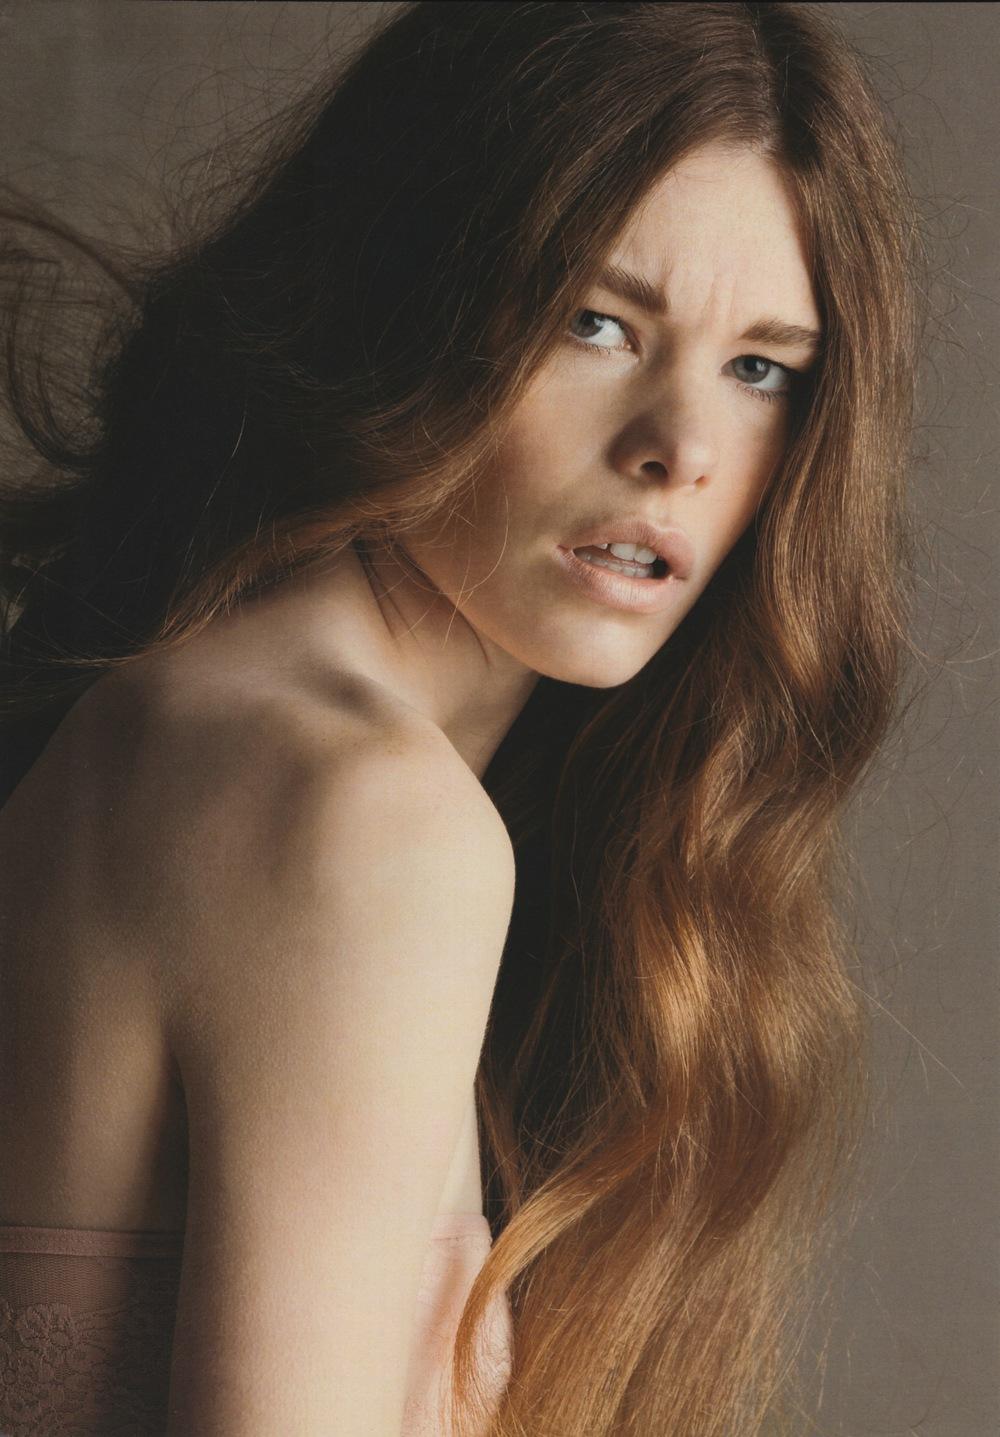 Model Pia KEA